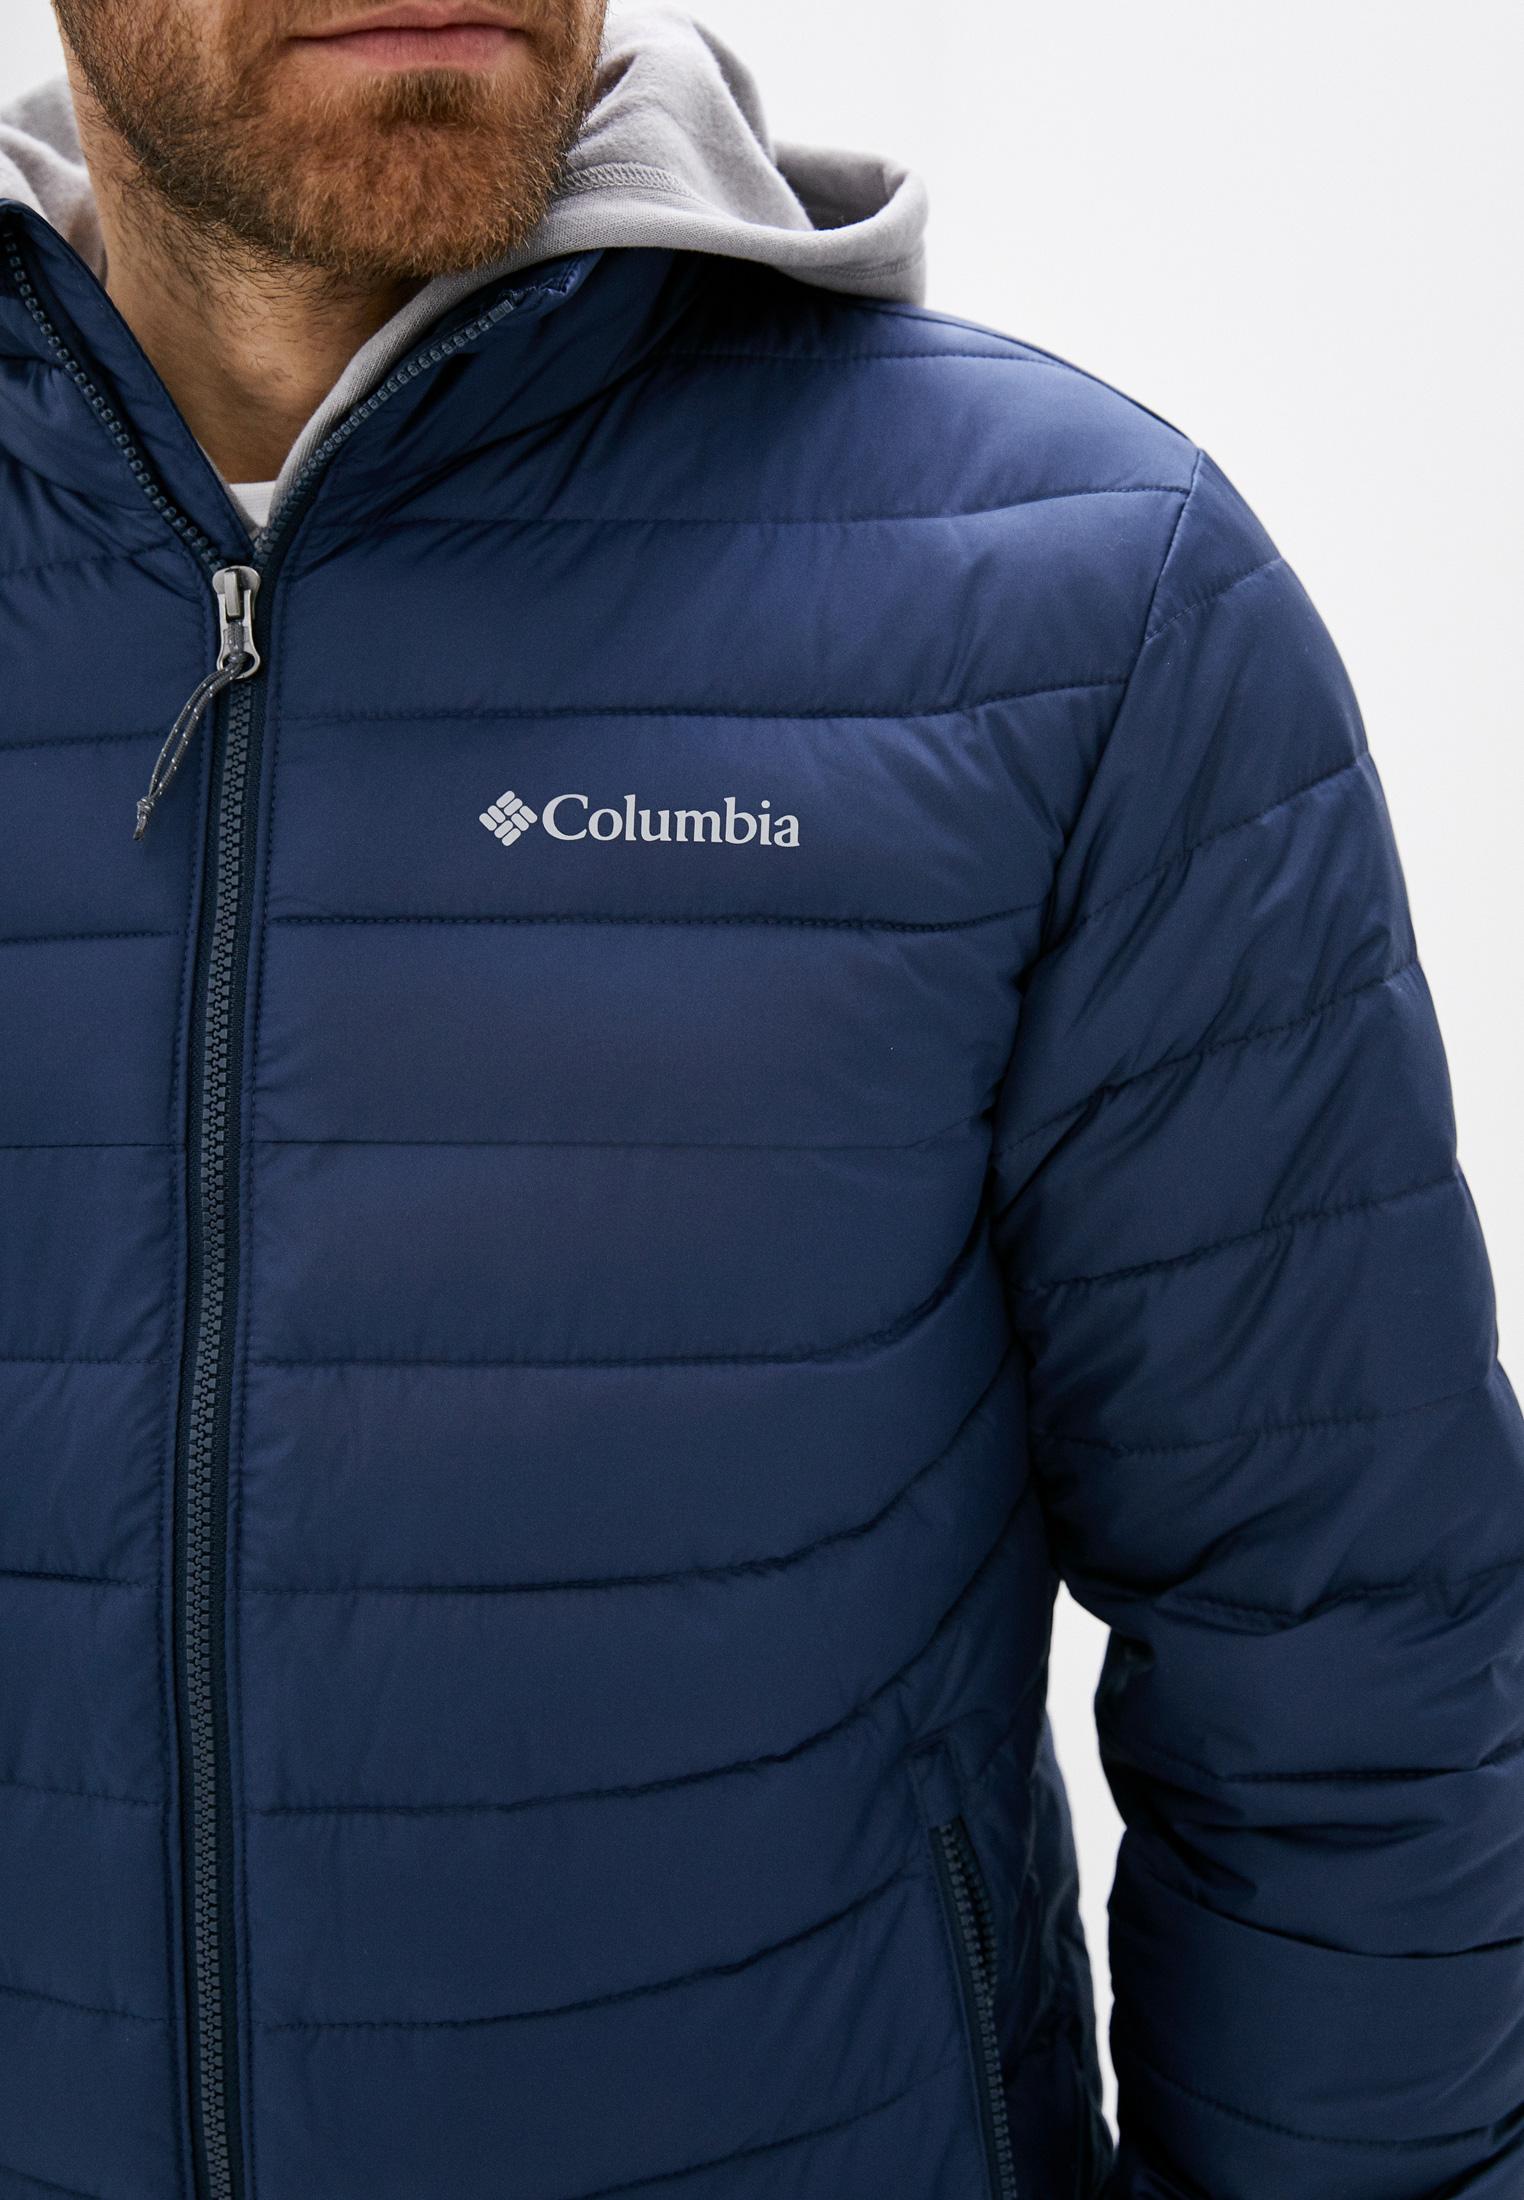 Columbia craigslist